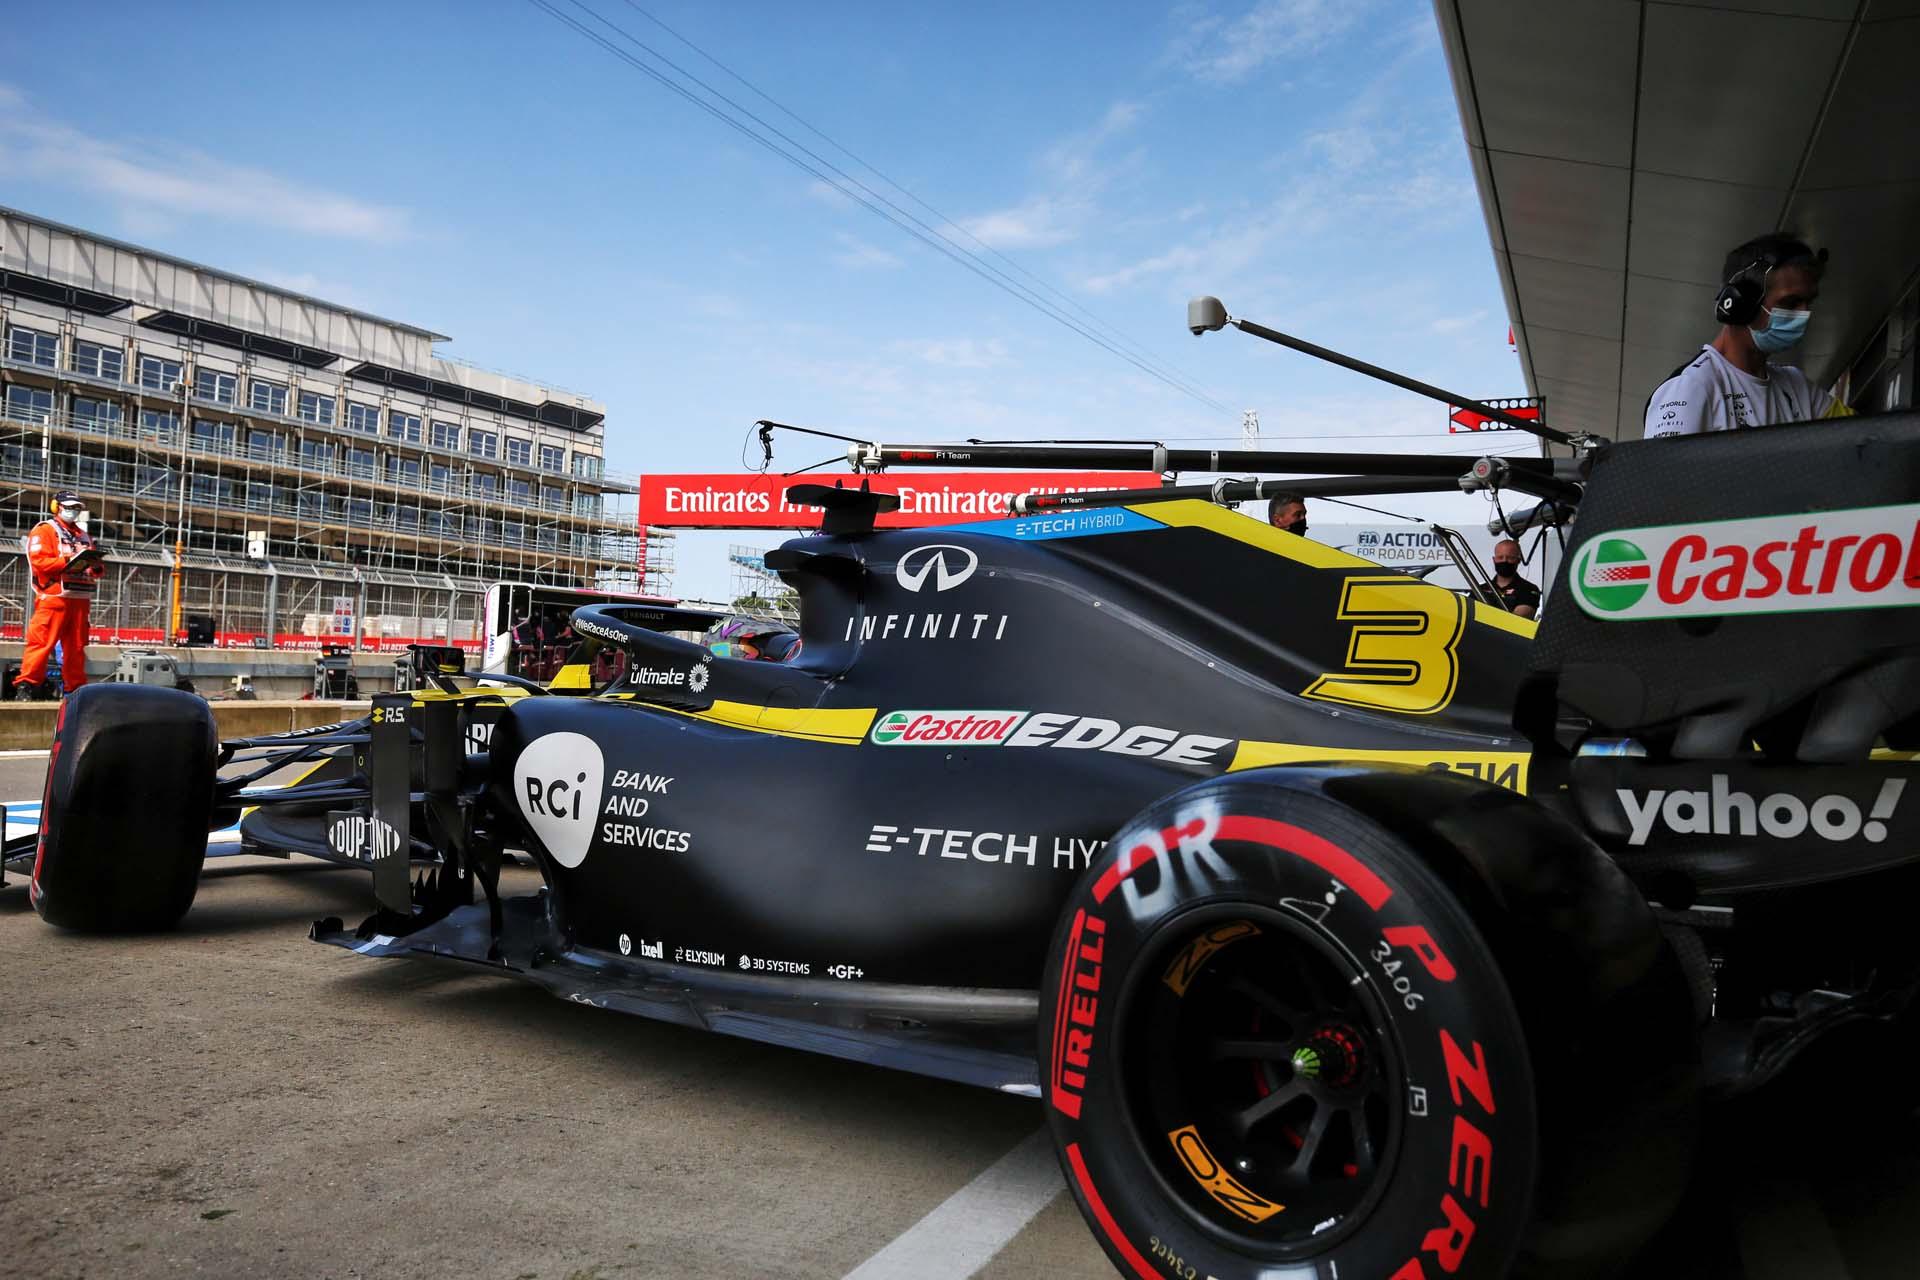 Motor Racing - Formula One World Championship - 70th Anniversary Grand Prix - Qualifying Day - Silverstone, England